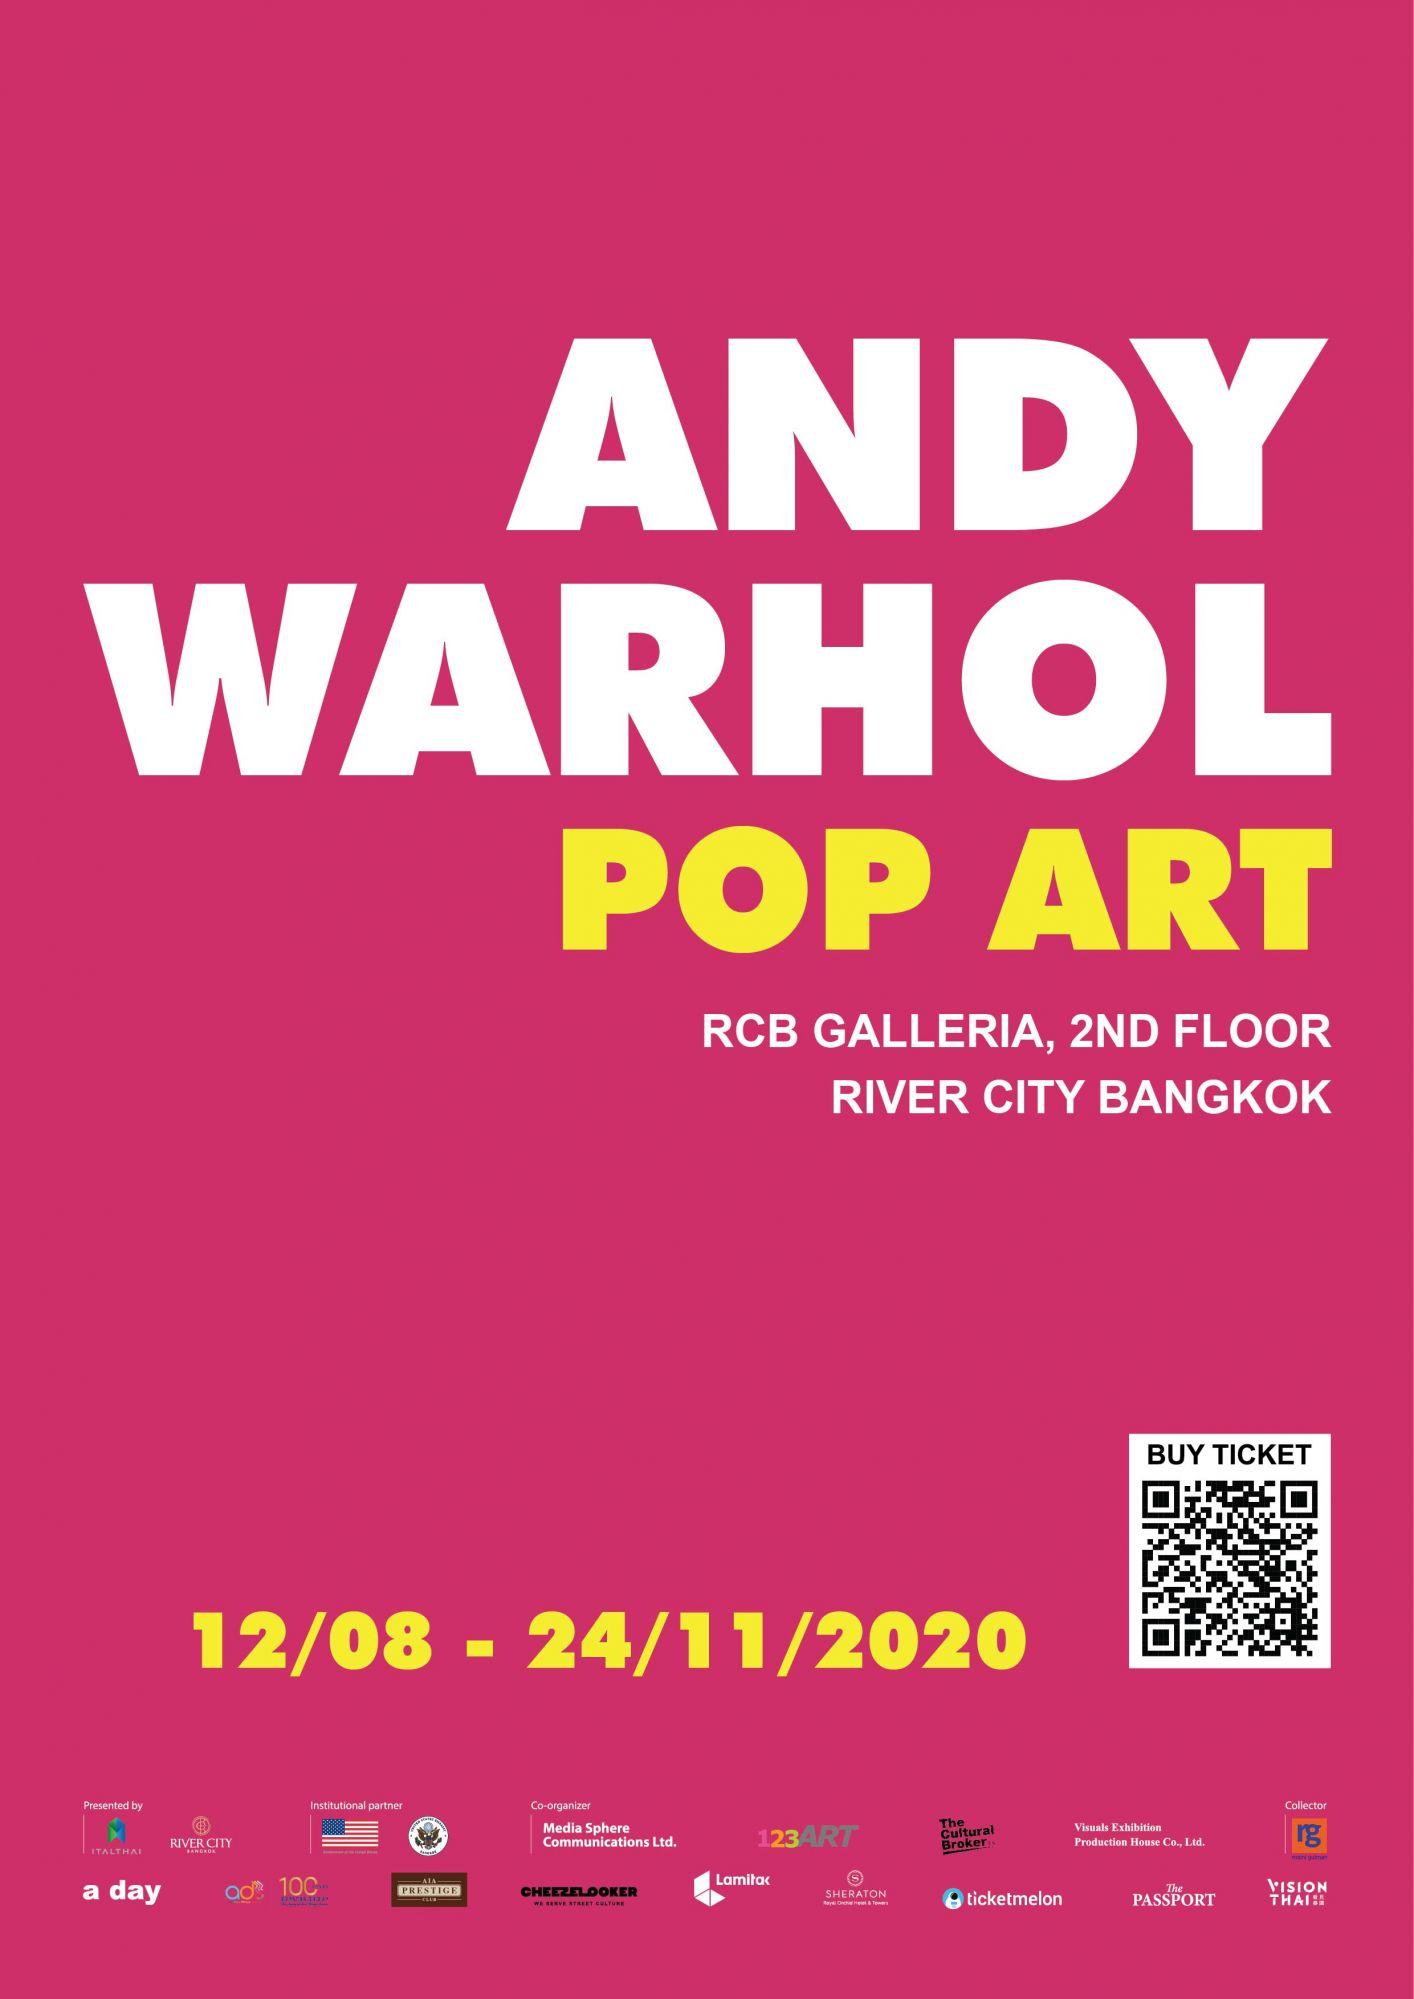 River City Bangkok Presents 'Andy Warhol: Pop Art' Exhibition